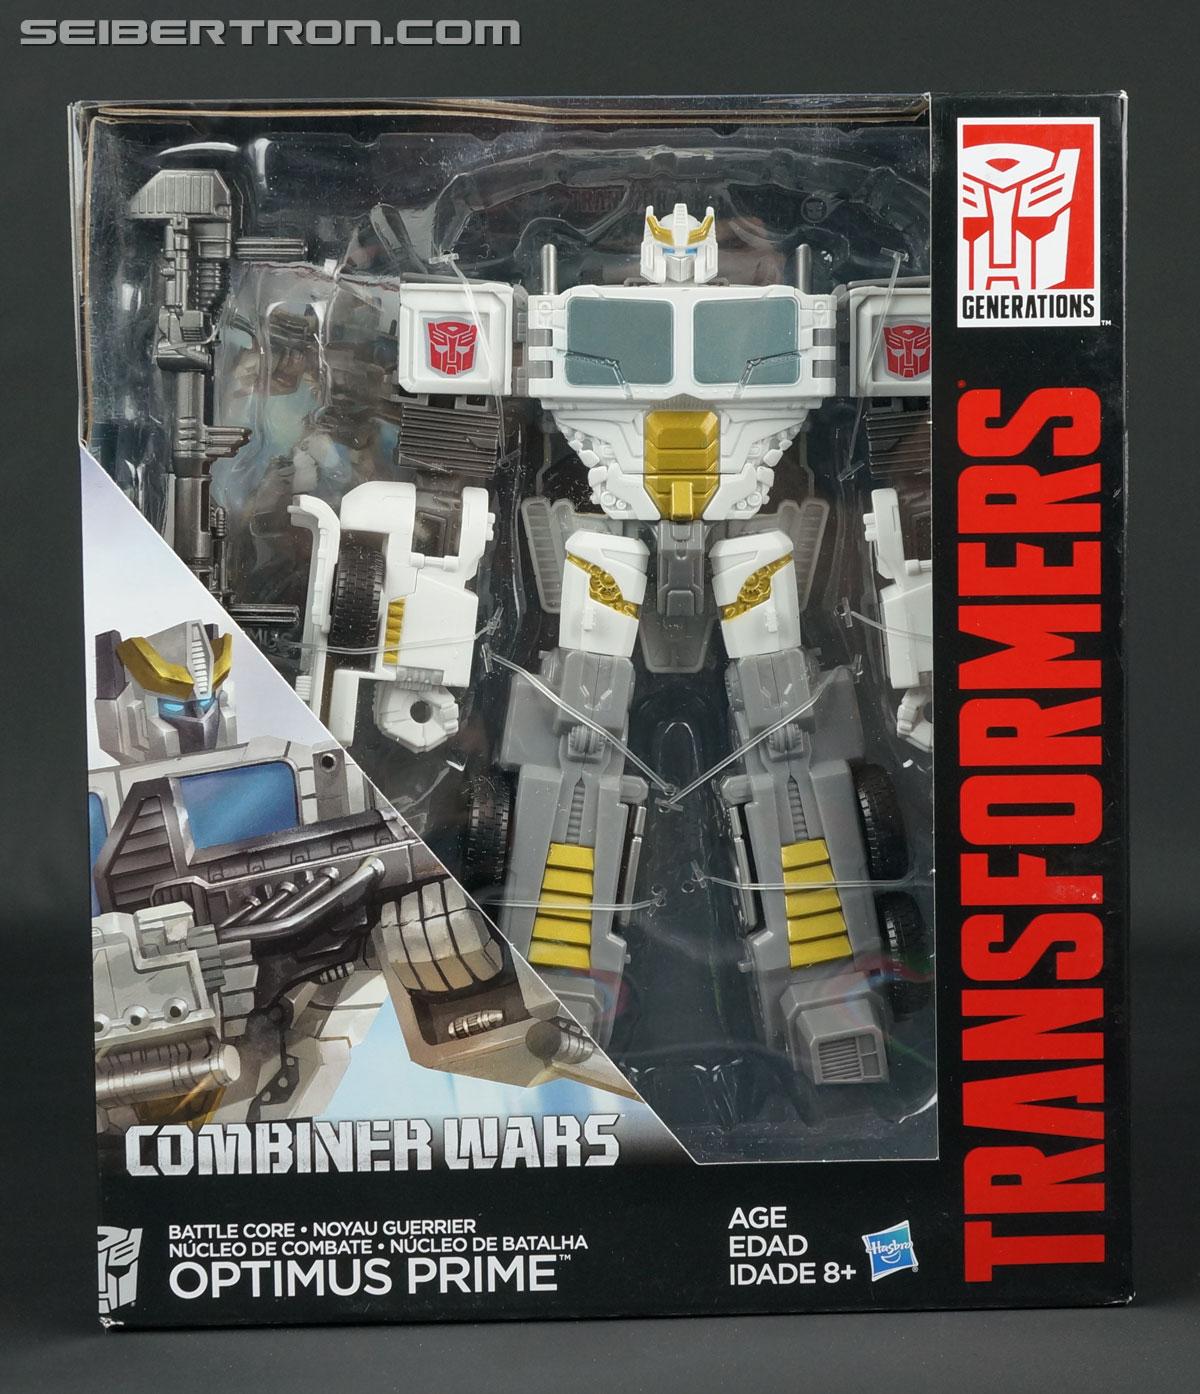 Transformers Generations Combiner Wars Battle Core Optimus Prime (Image #1 of 121)